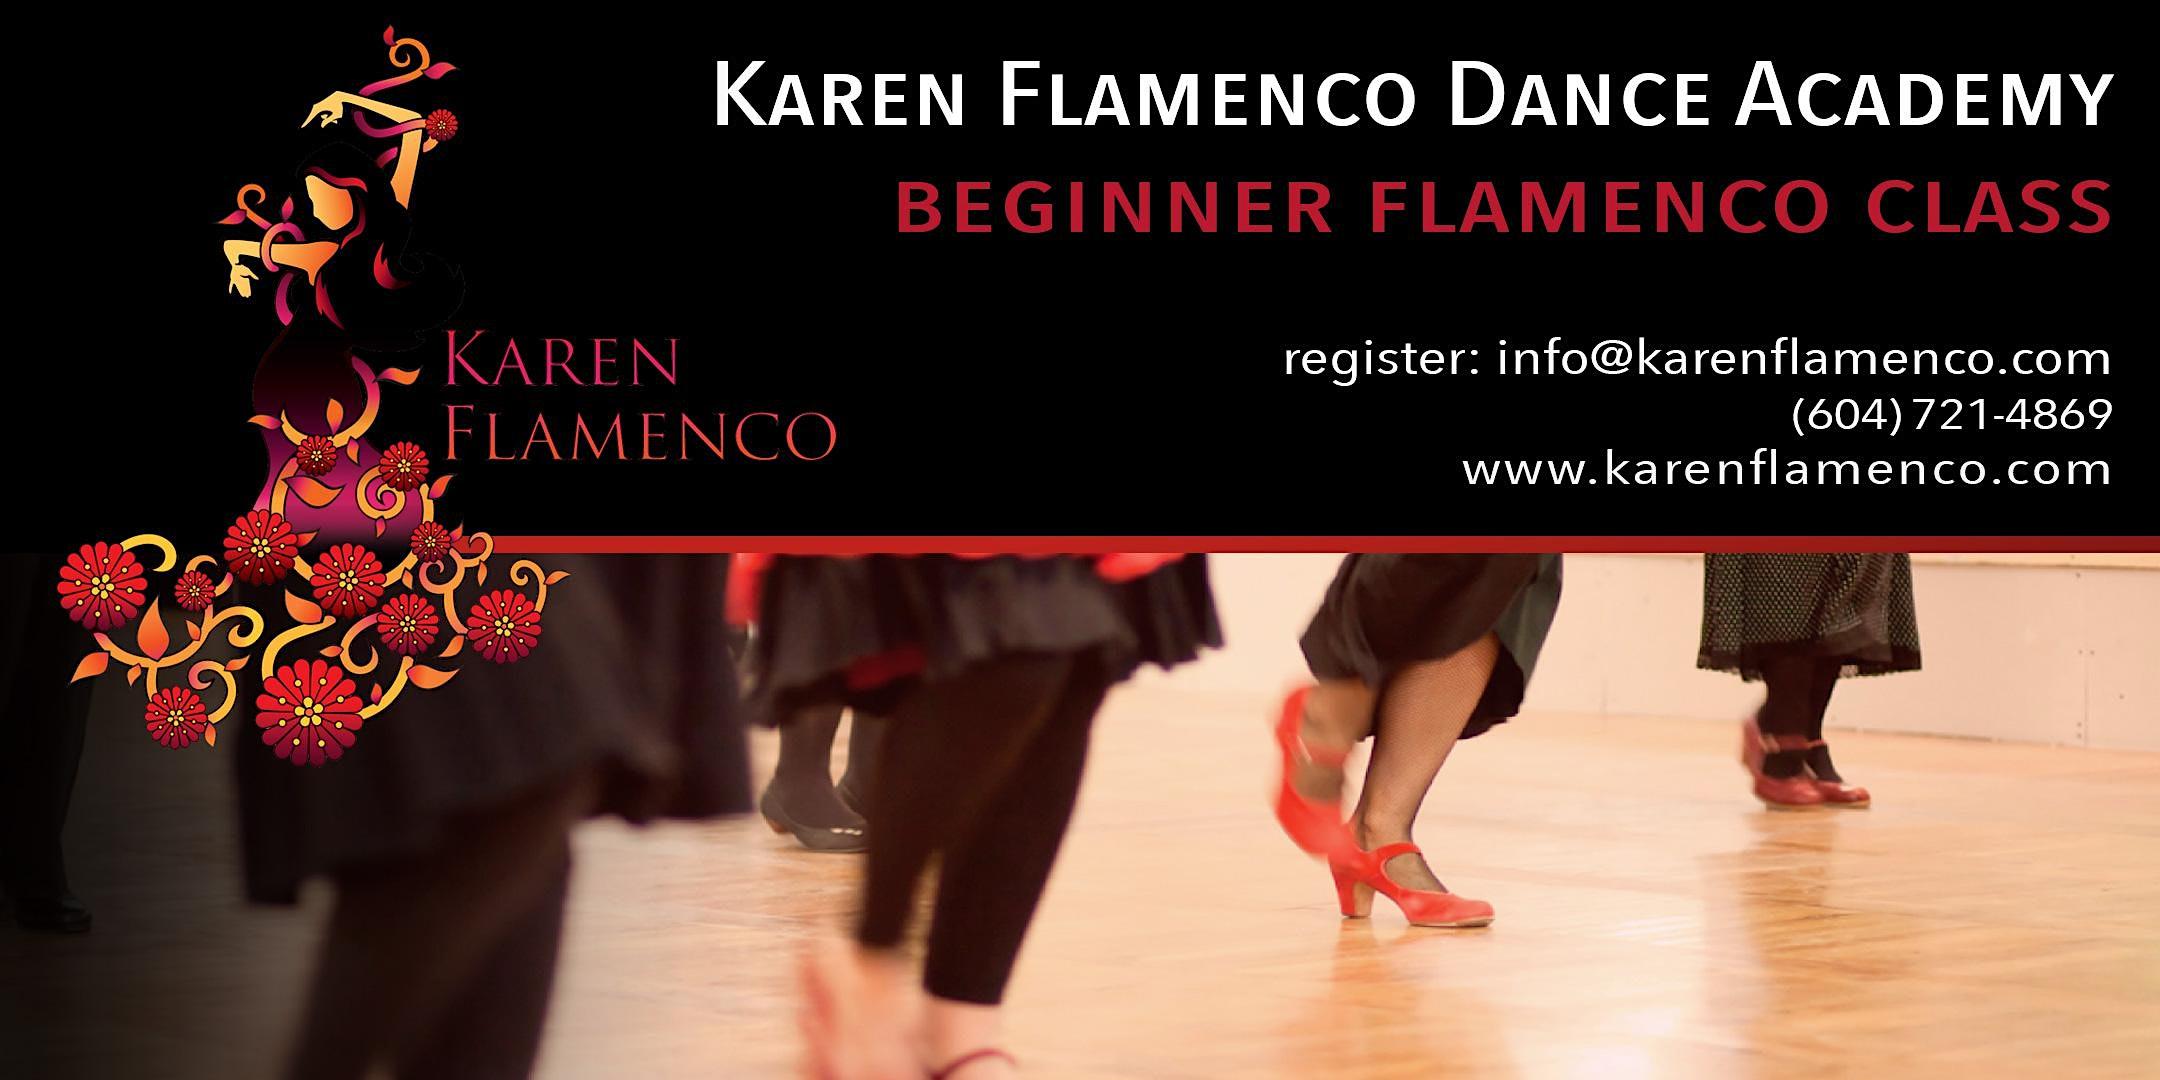 Karen Flamenco Dance Academy - Beginner Flamenco Class